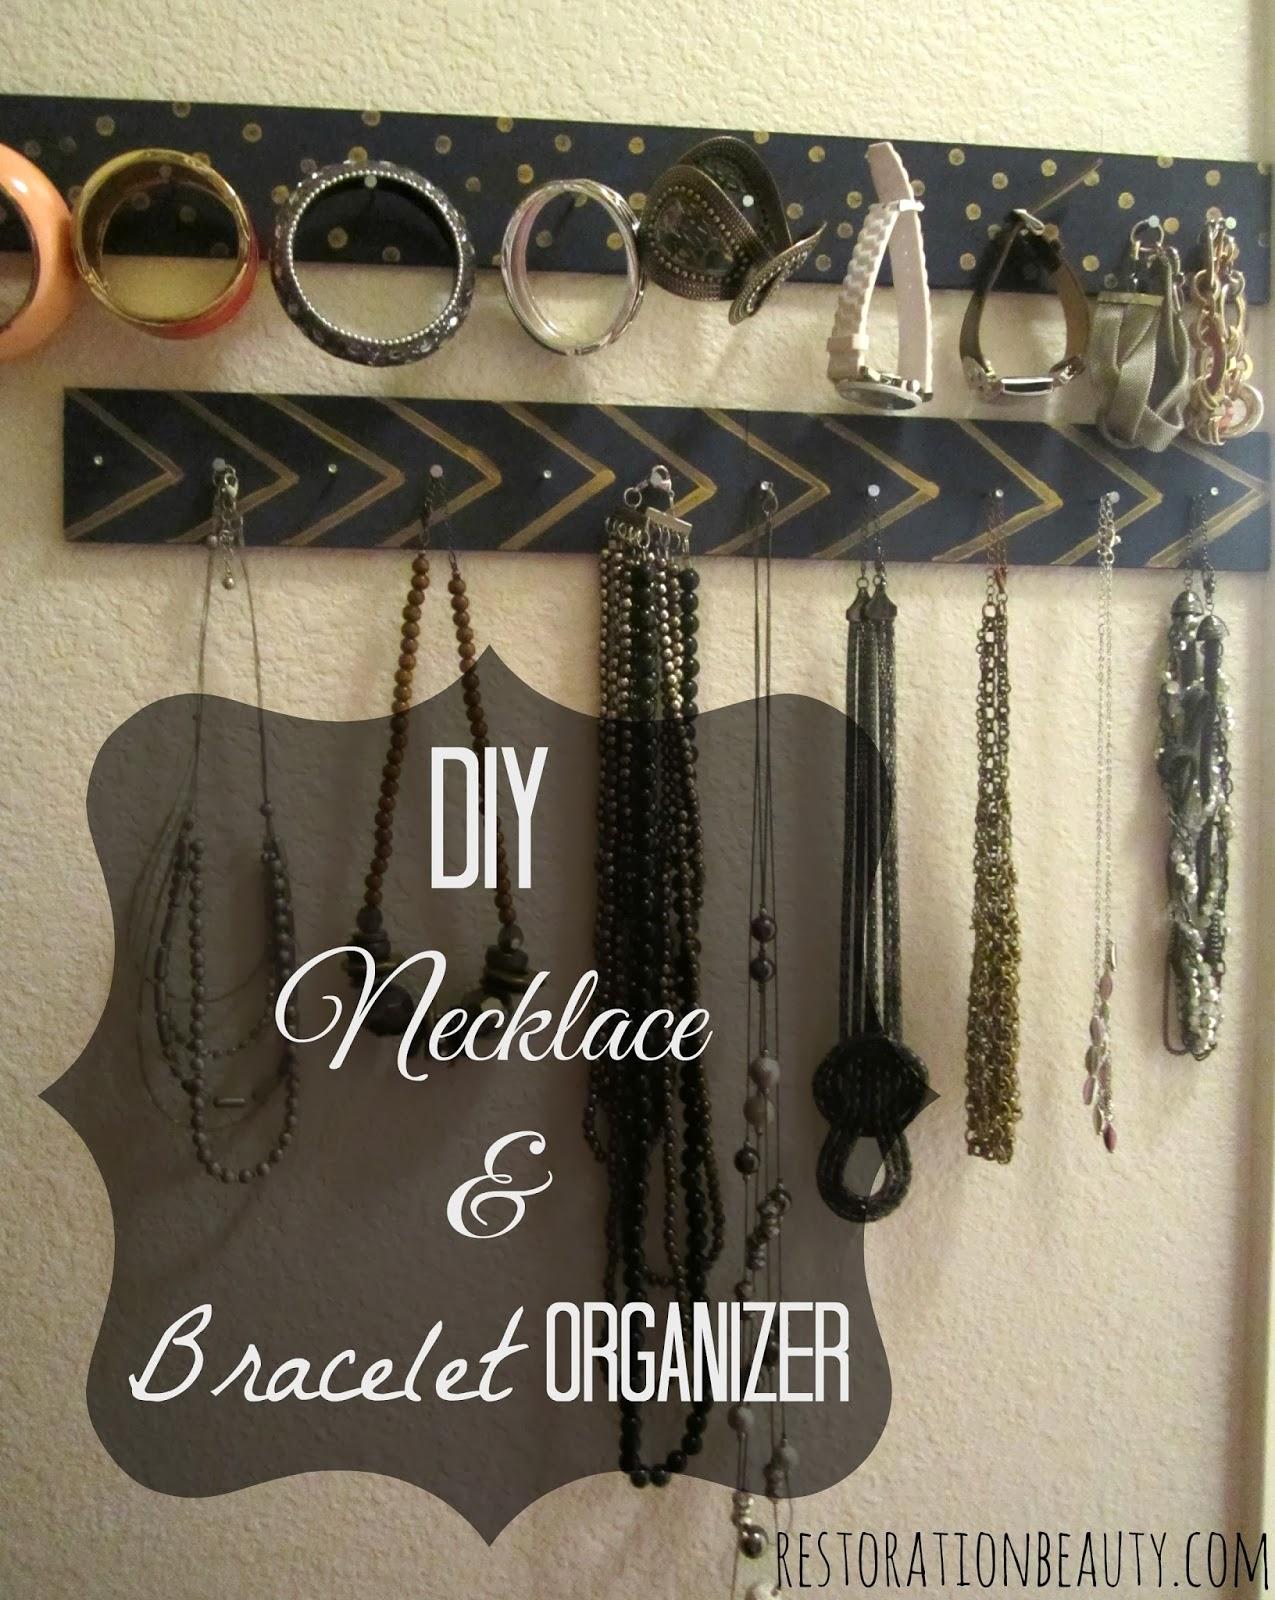 Restoration beauty diy necklace bracelet organizer for Bangle organizer diy